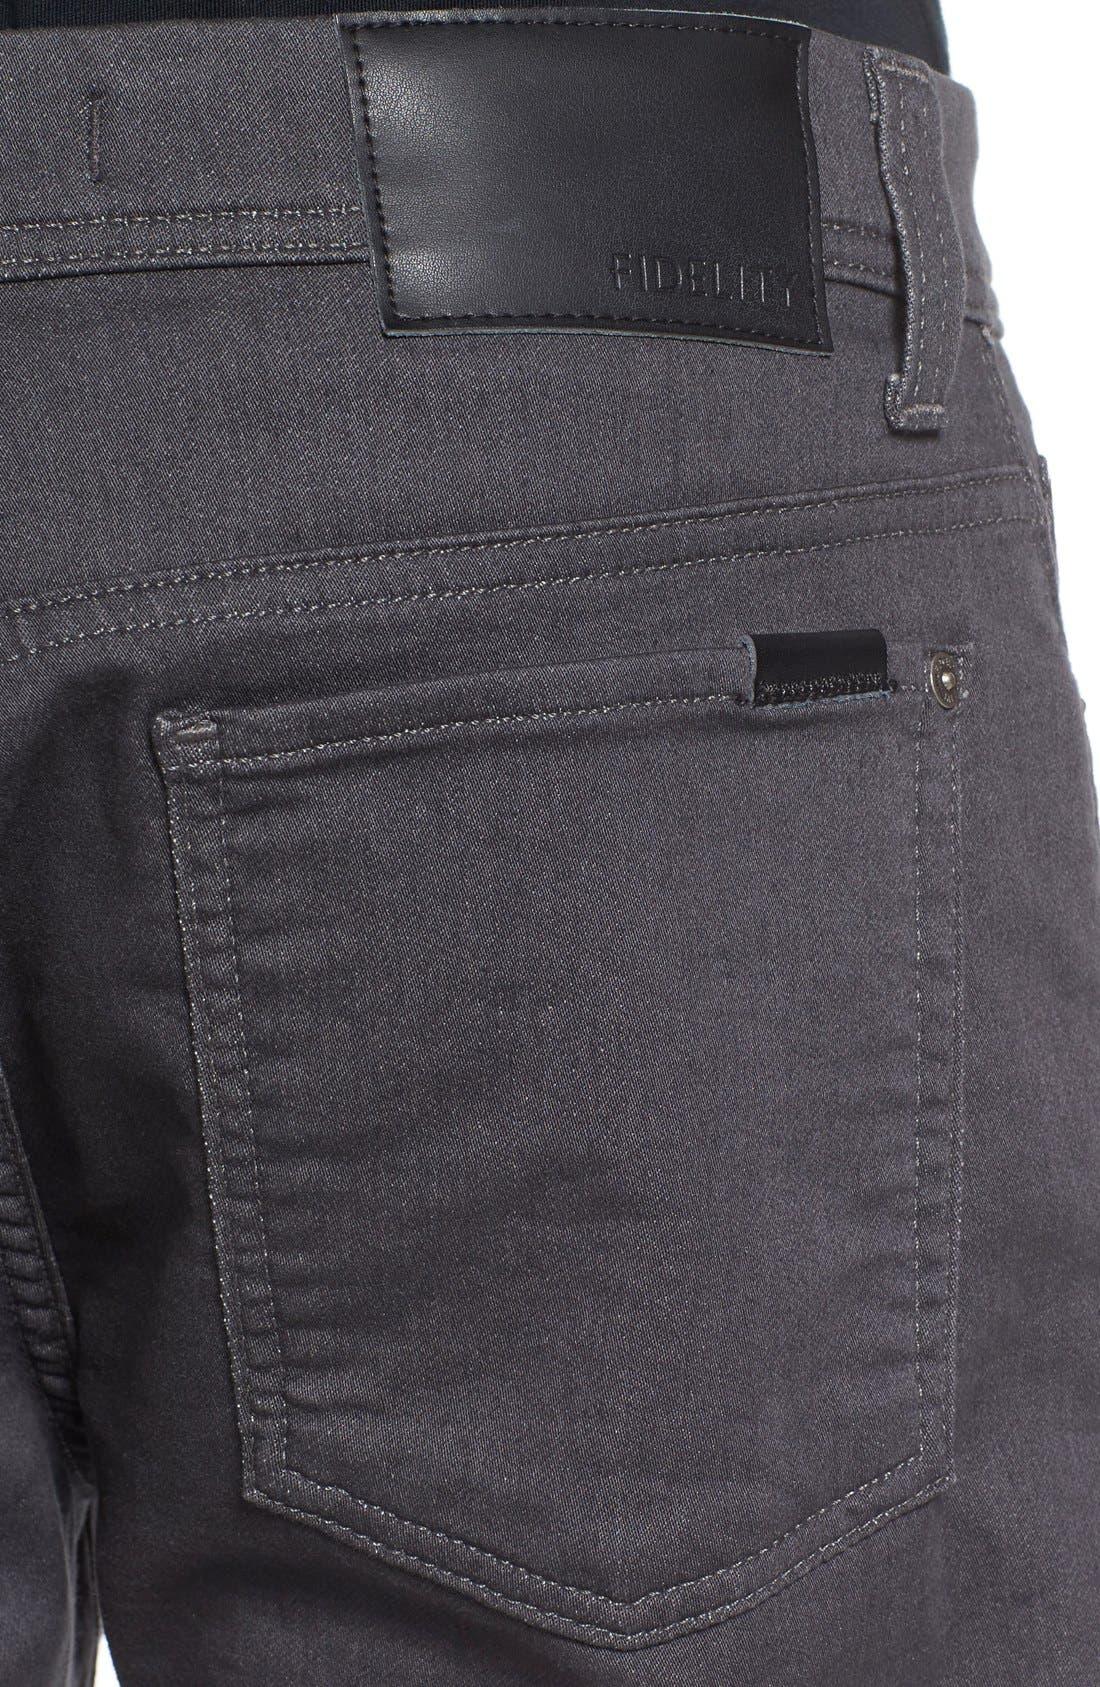 Torino Slim Fit Jeans,                             Alternate thumbnail 4, color,                             Fox Grey